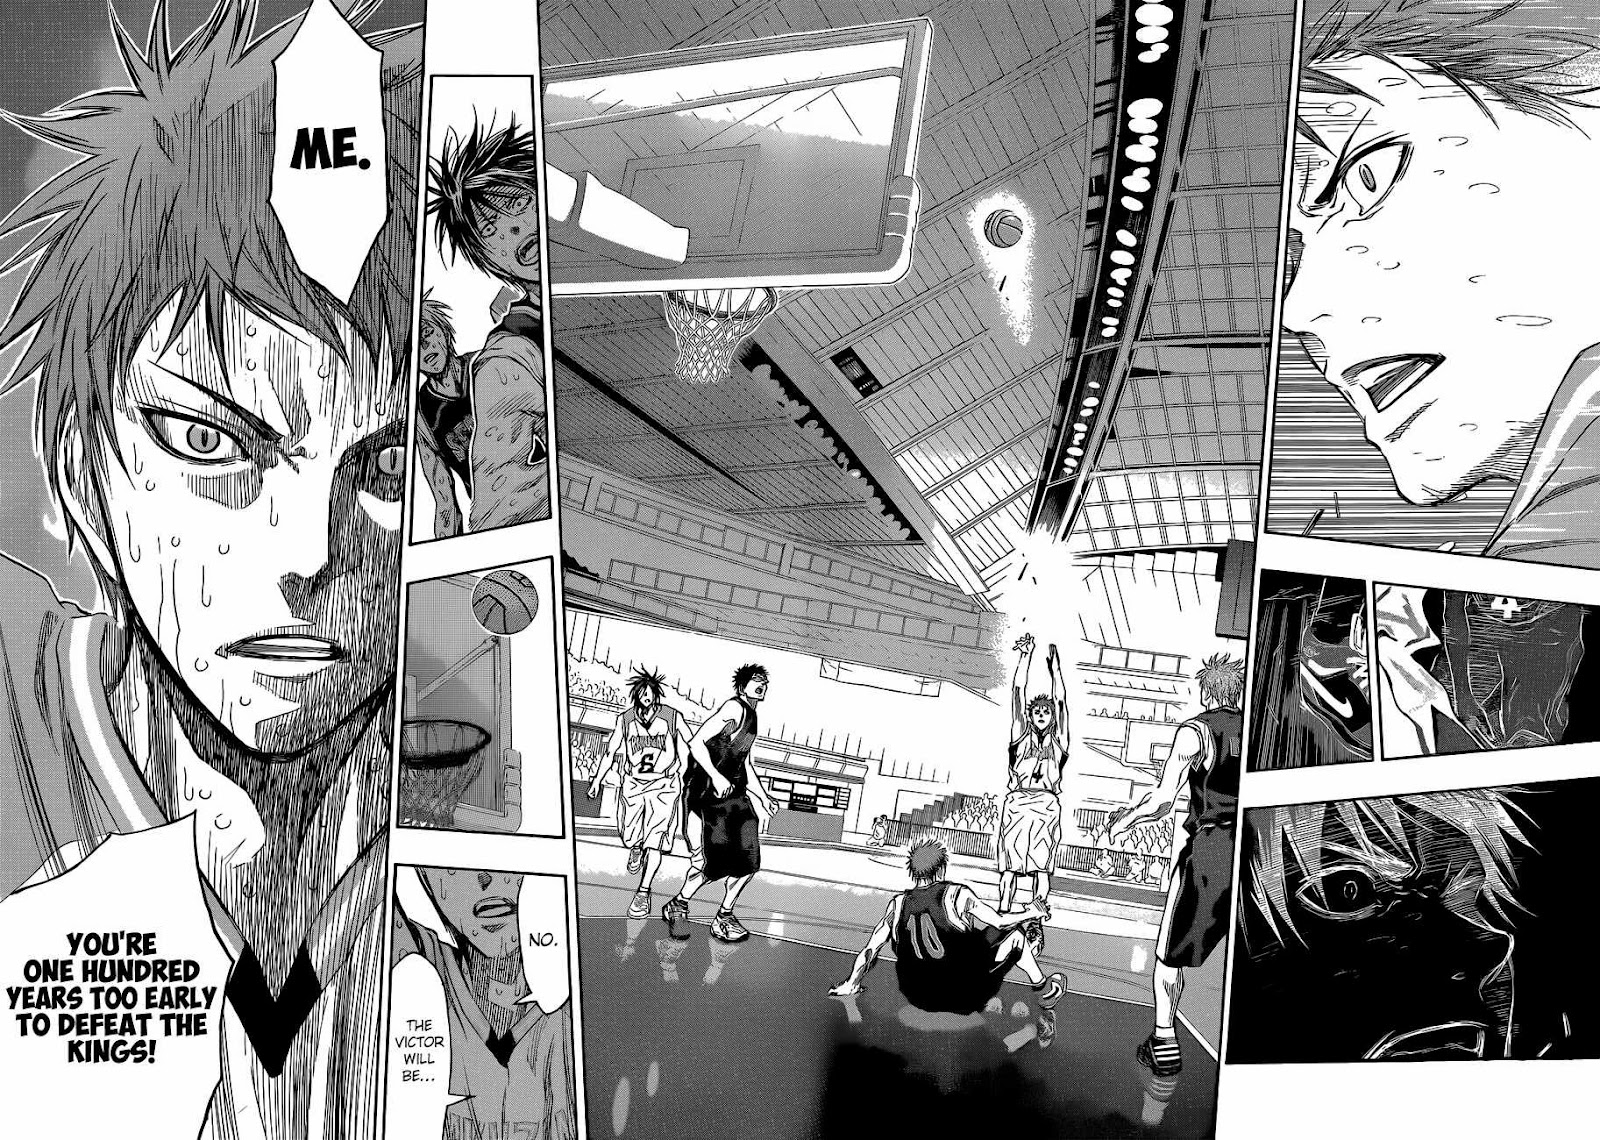 Kuroko no Basket Manga Chapter 271 - Image 16-17